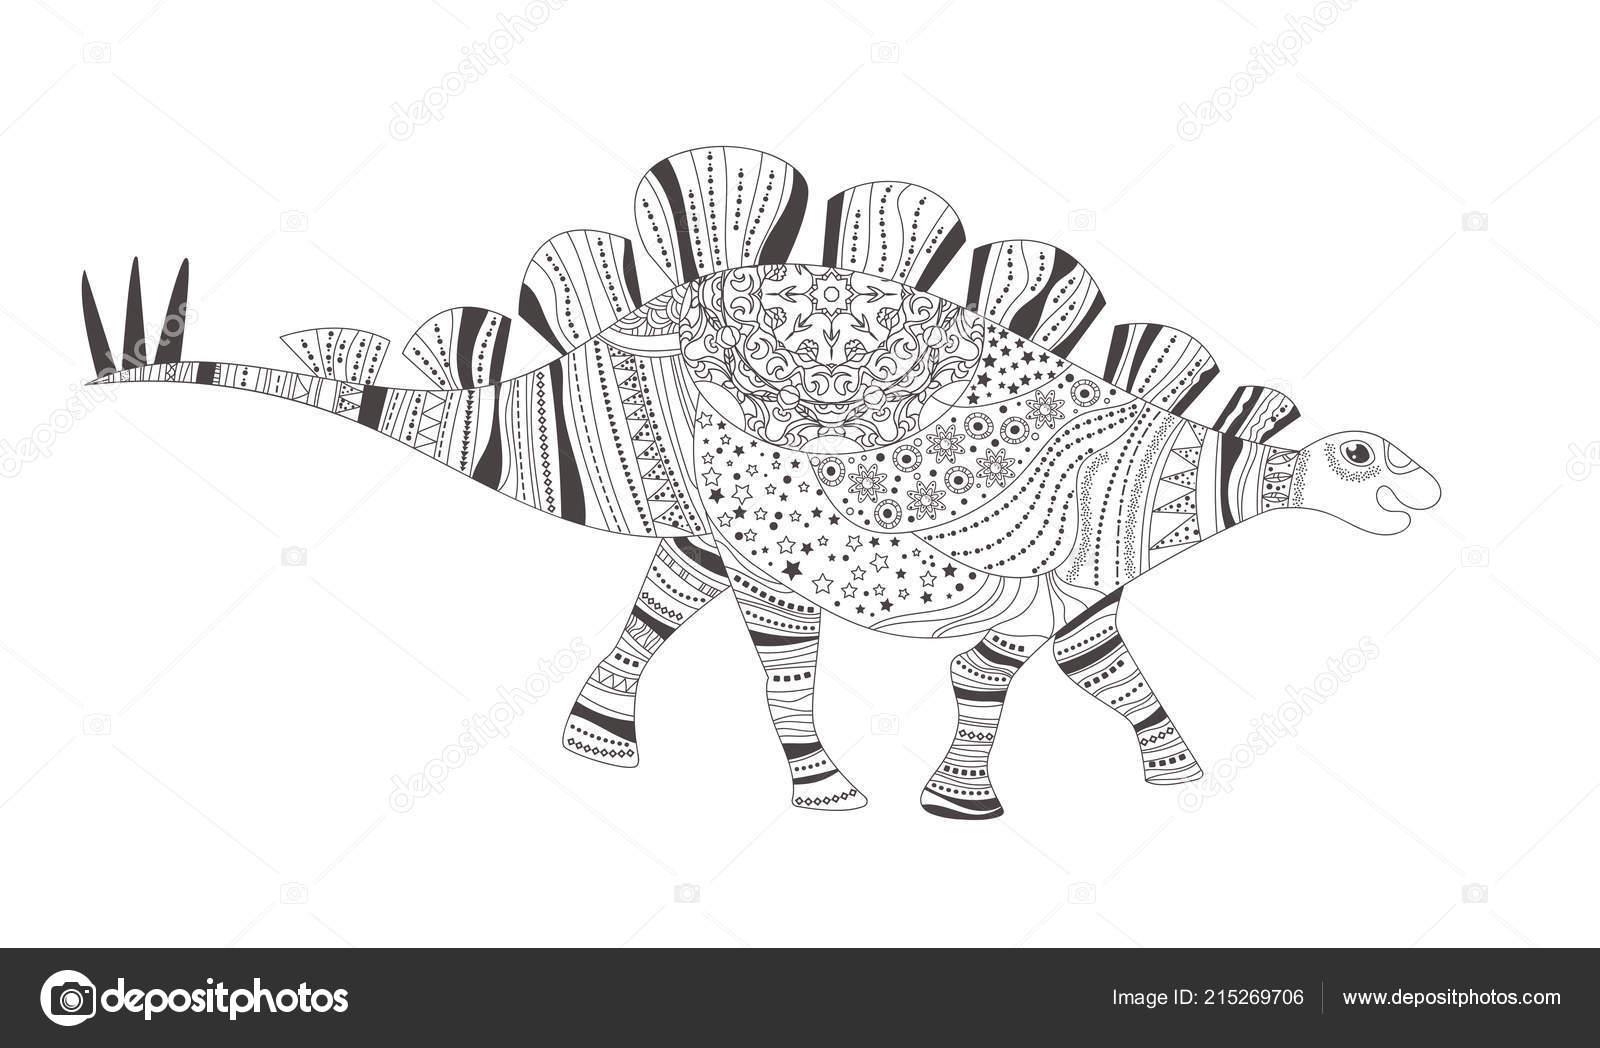 Dinozor Boyama Sayfası Vektör çizgi Film Beyaz Izole Sanat